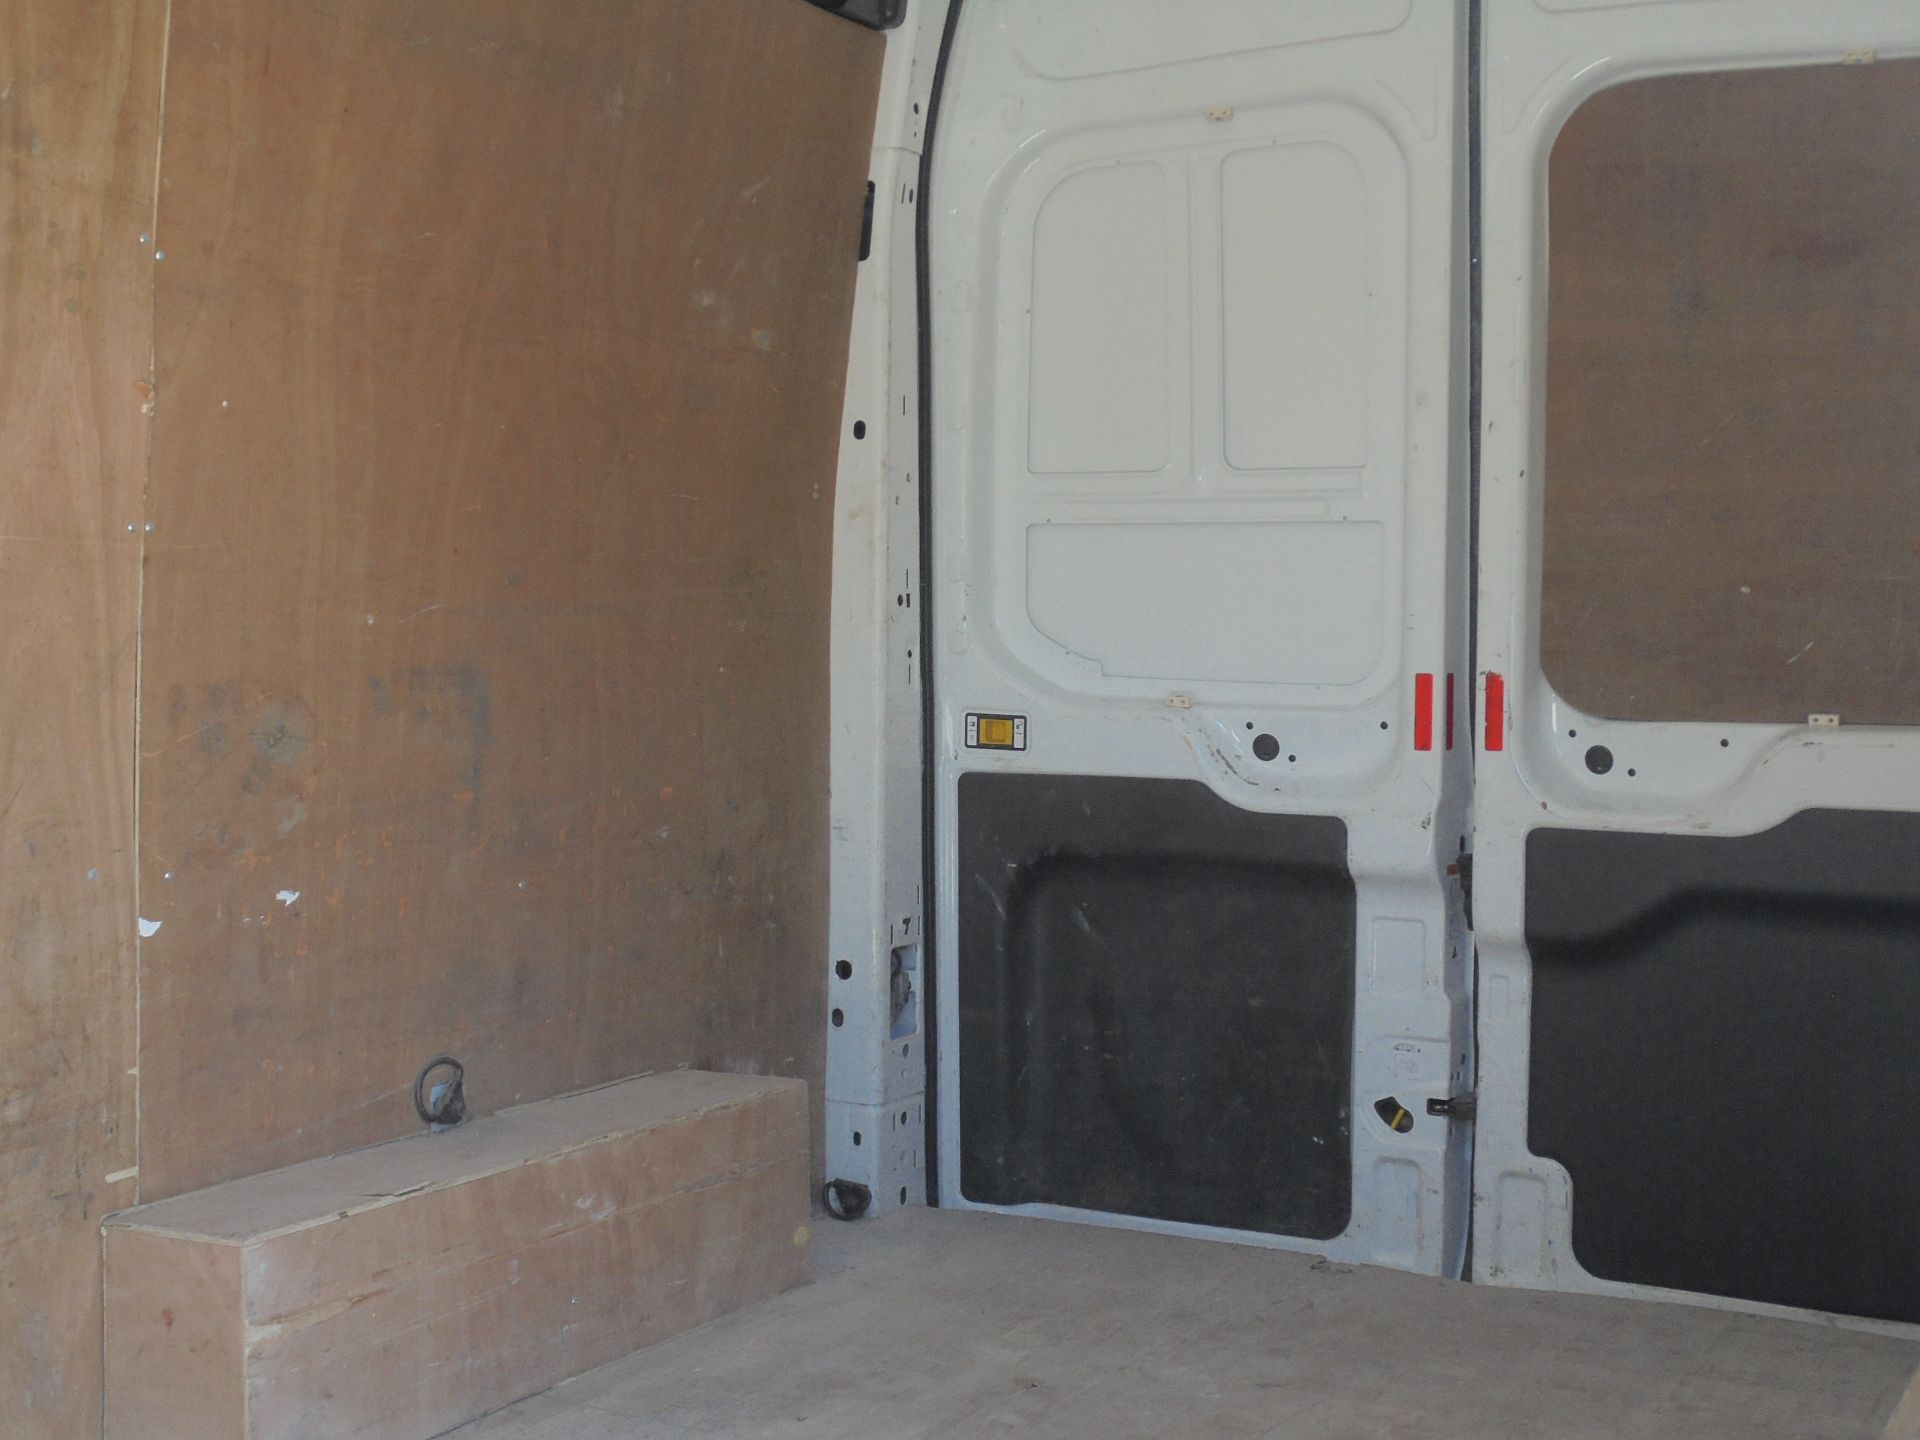 2017 Ford Transit 2.0 Tdci 130Ps H3 Van (FH17UKY) Image 7